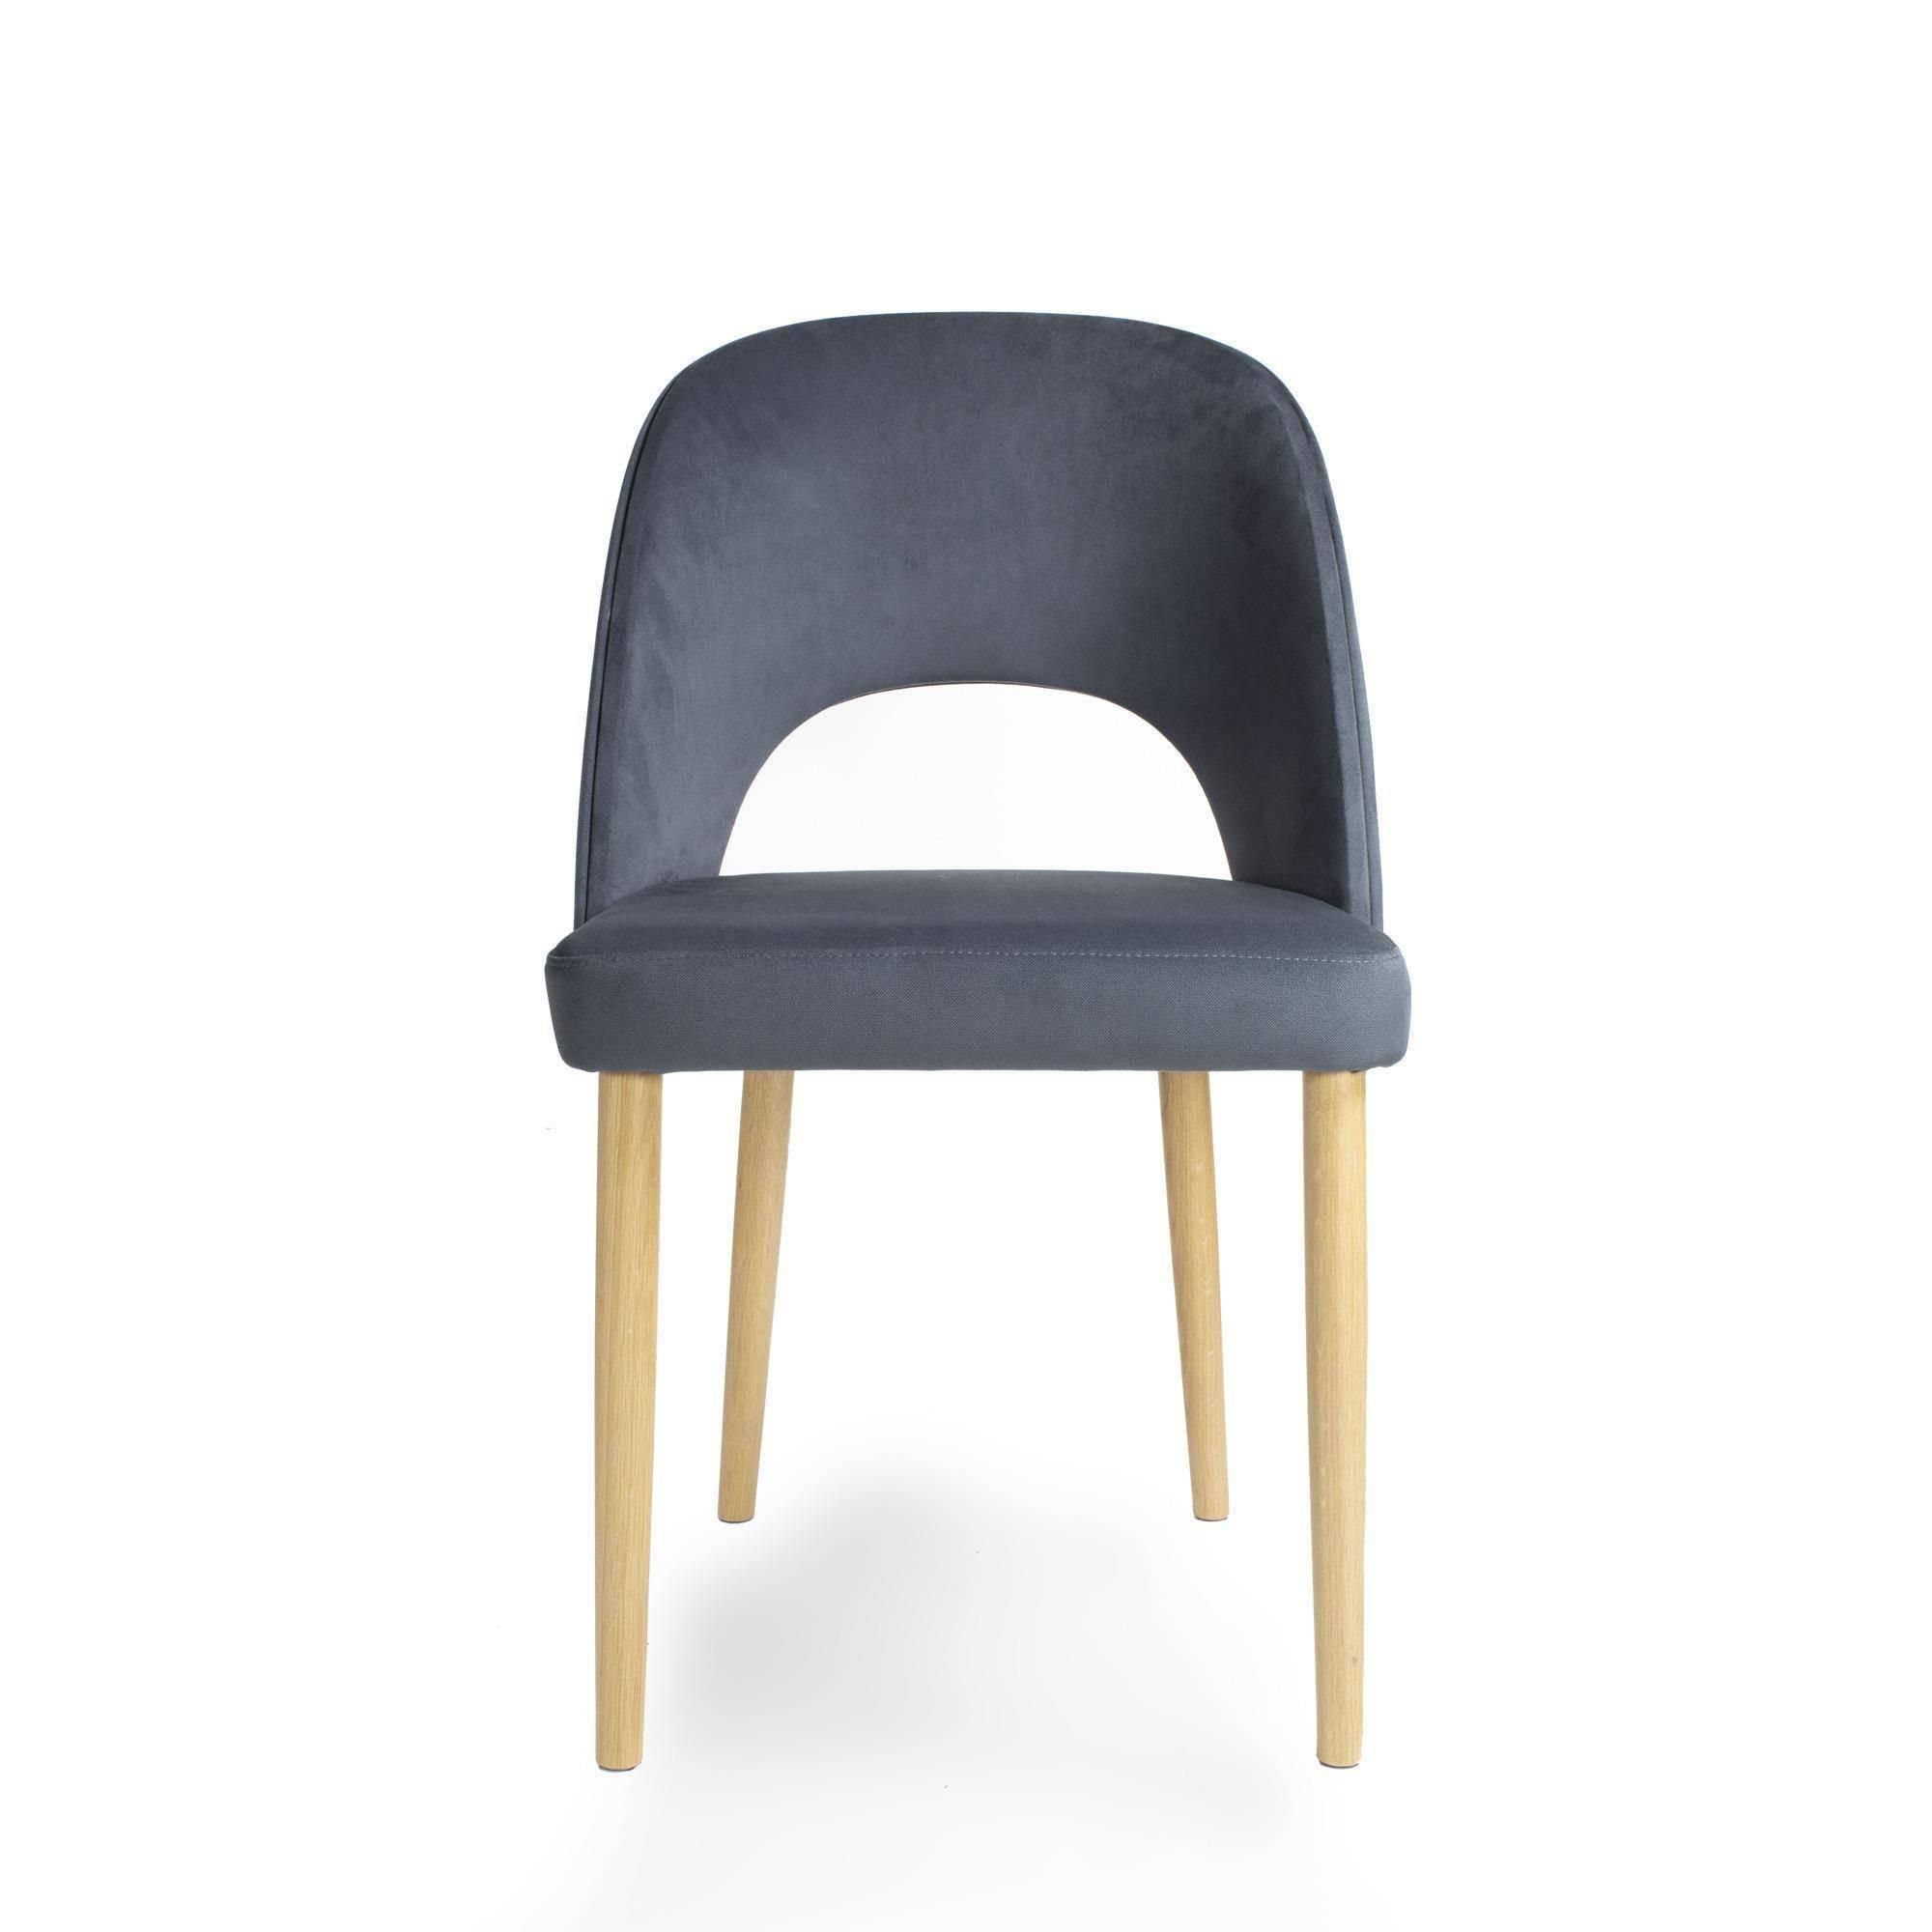 FAMEG :: Krzesło A-1412 dąb naturalny / tkanina tokyo T118